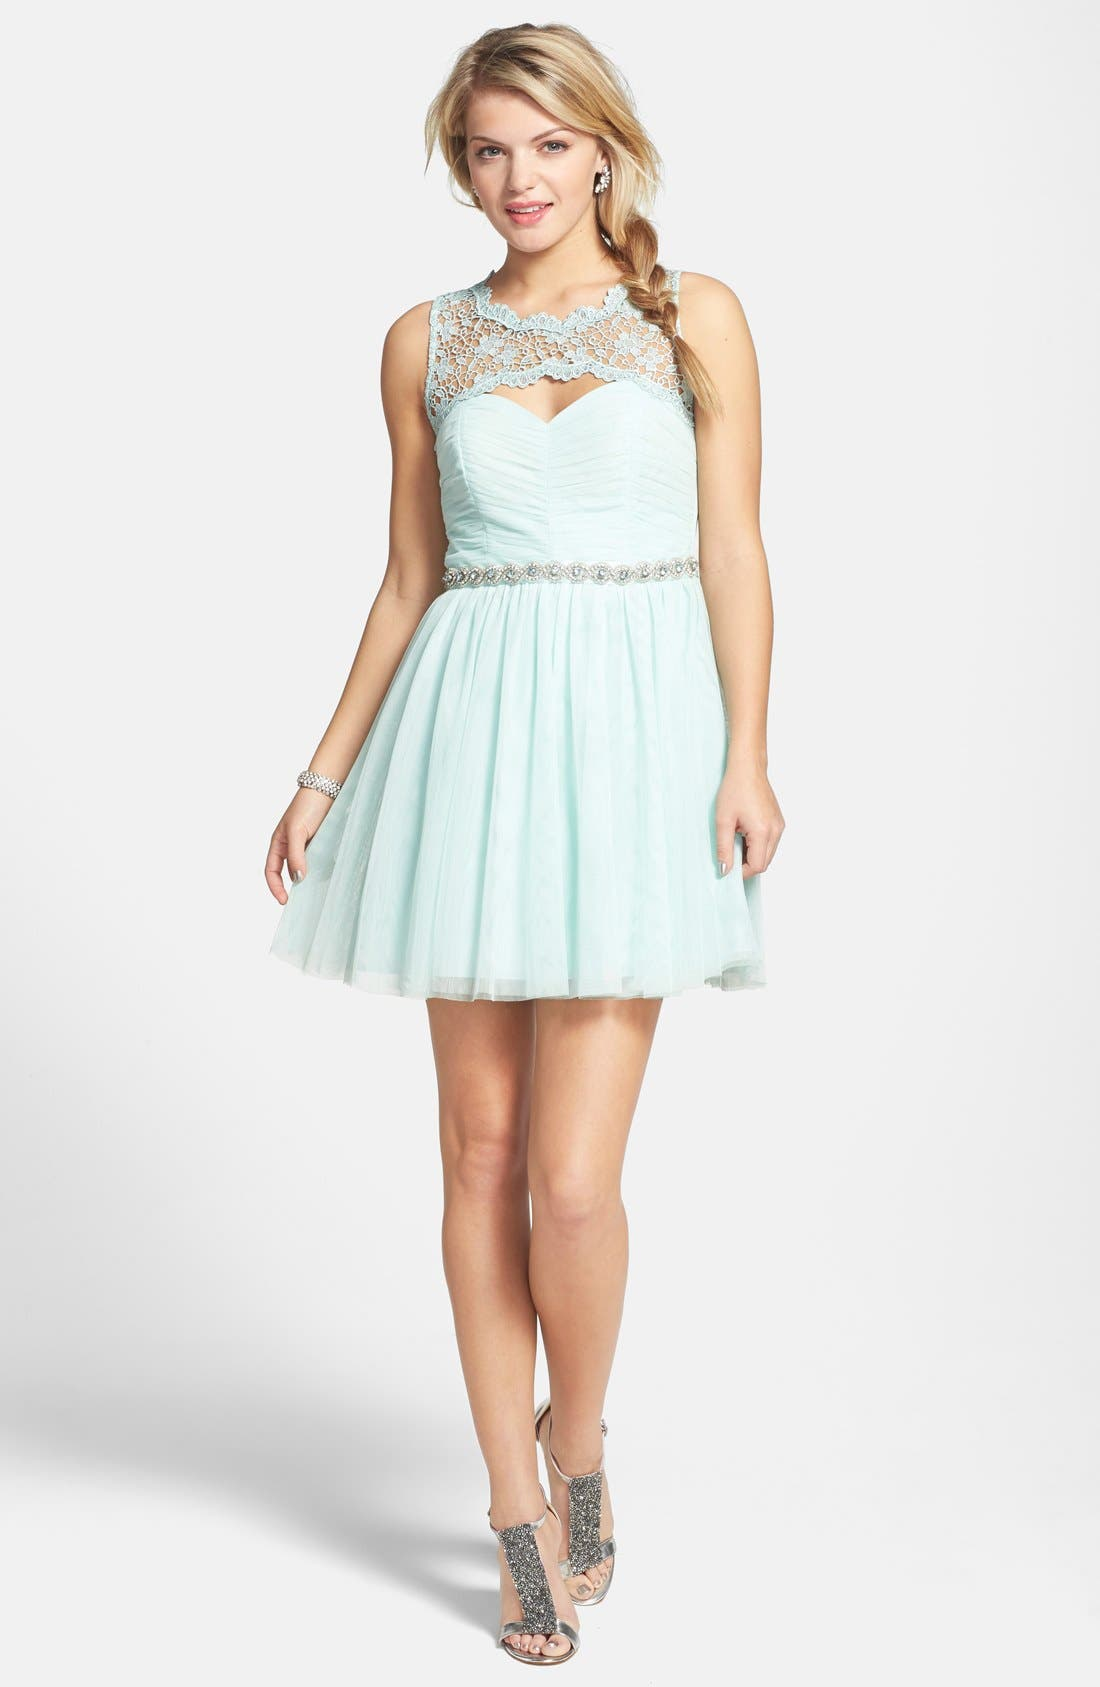 Main Image - Sequin Hearts Embellished Dress (Juniors)